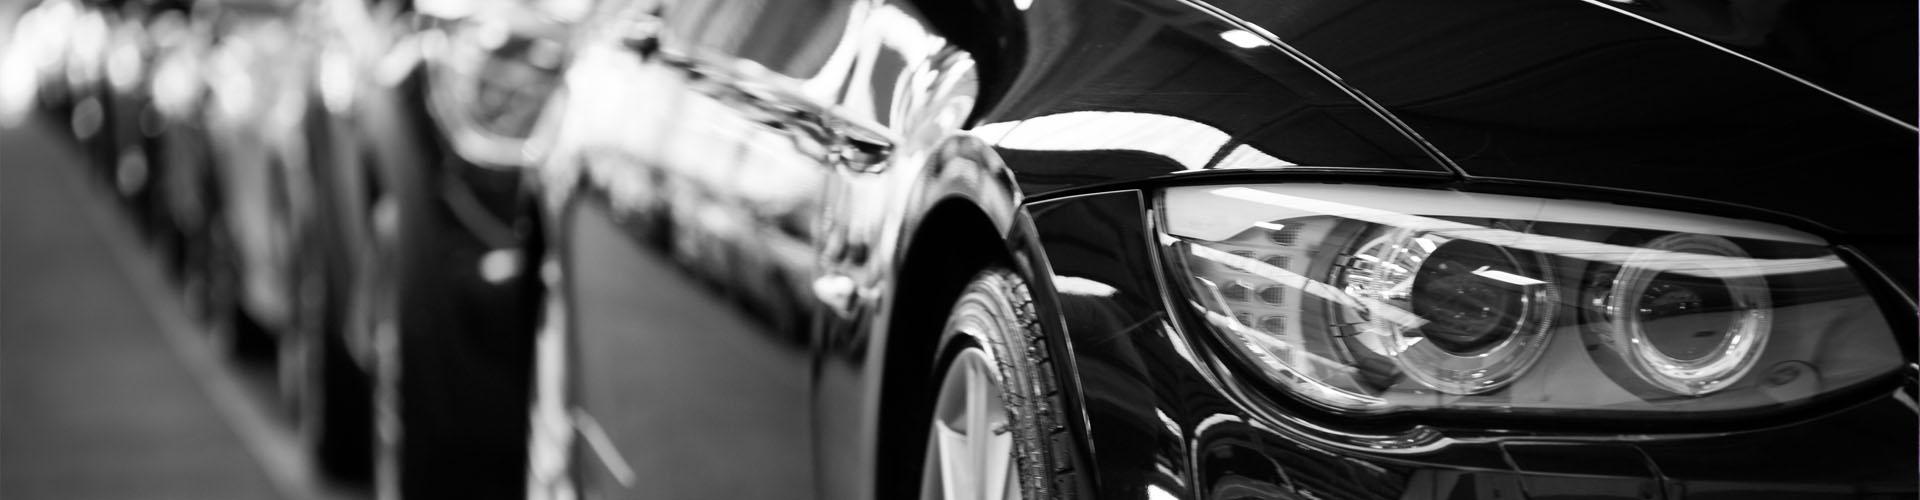 Transport insurance. Vehicle fleets. Large Accounts